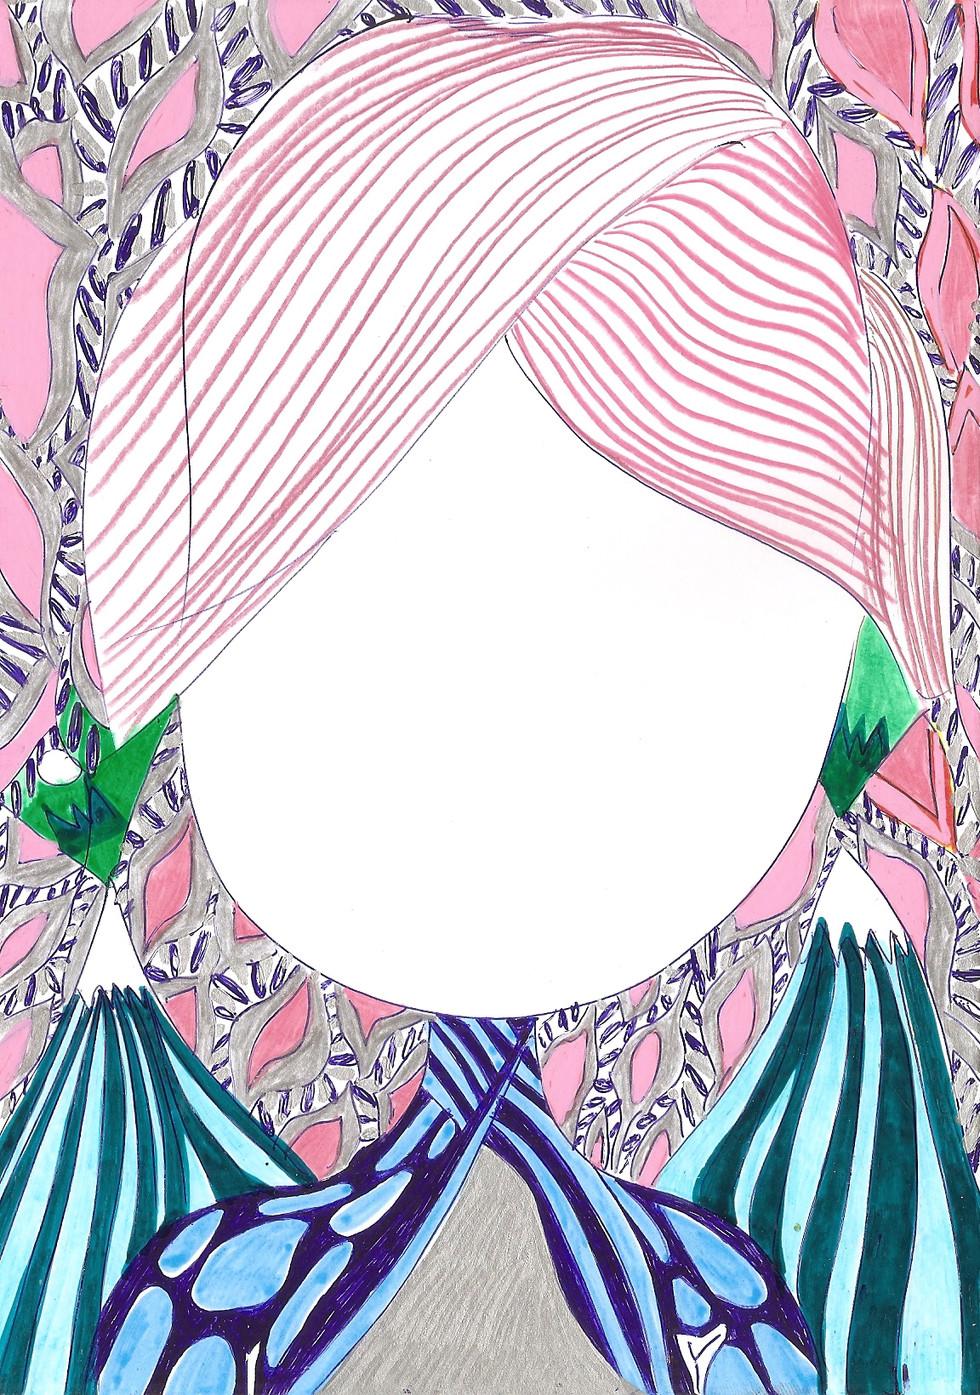 SPIEGEL, alu dibond, photo paper, porcelain pen, marker, fineliner, 14.8cmx21cm © Natalija Ribovic 2019